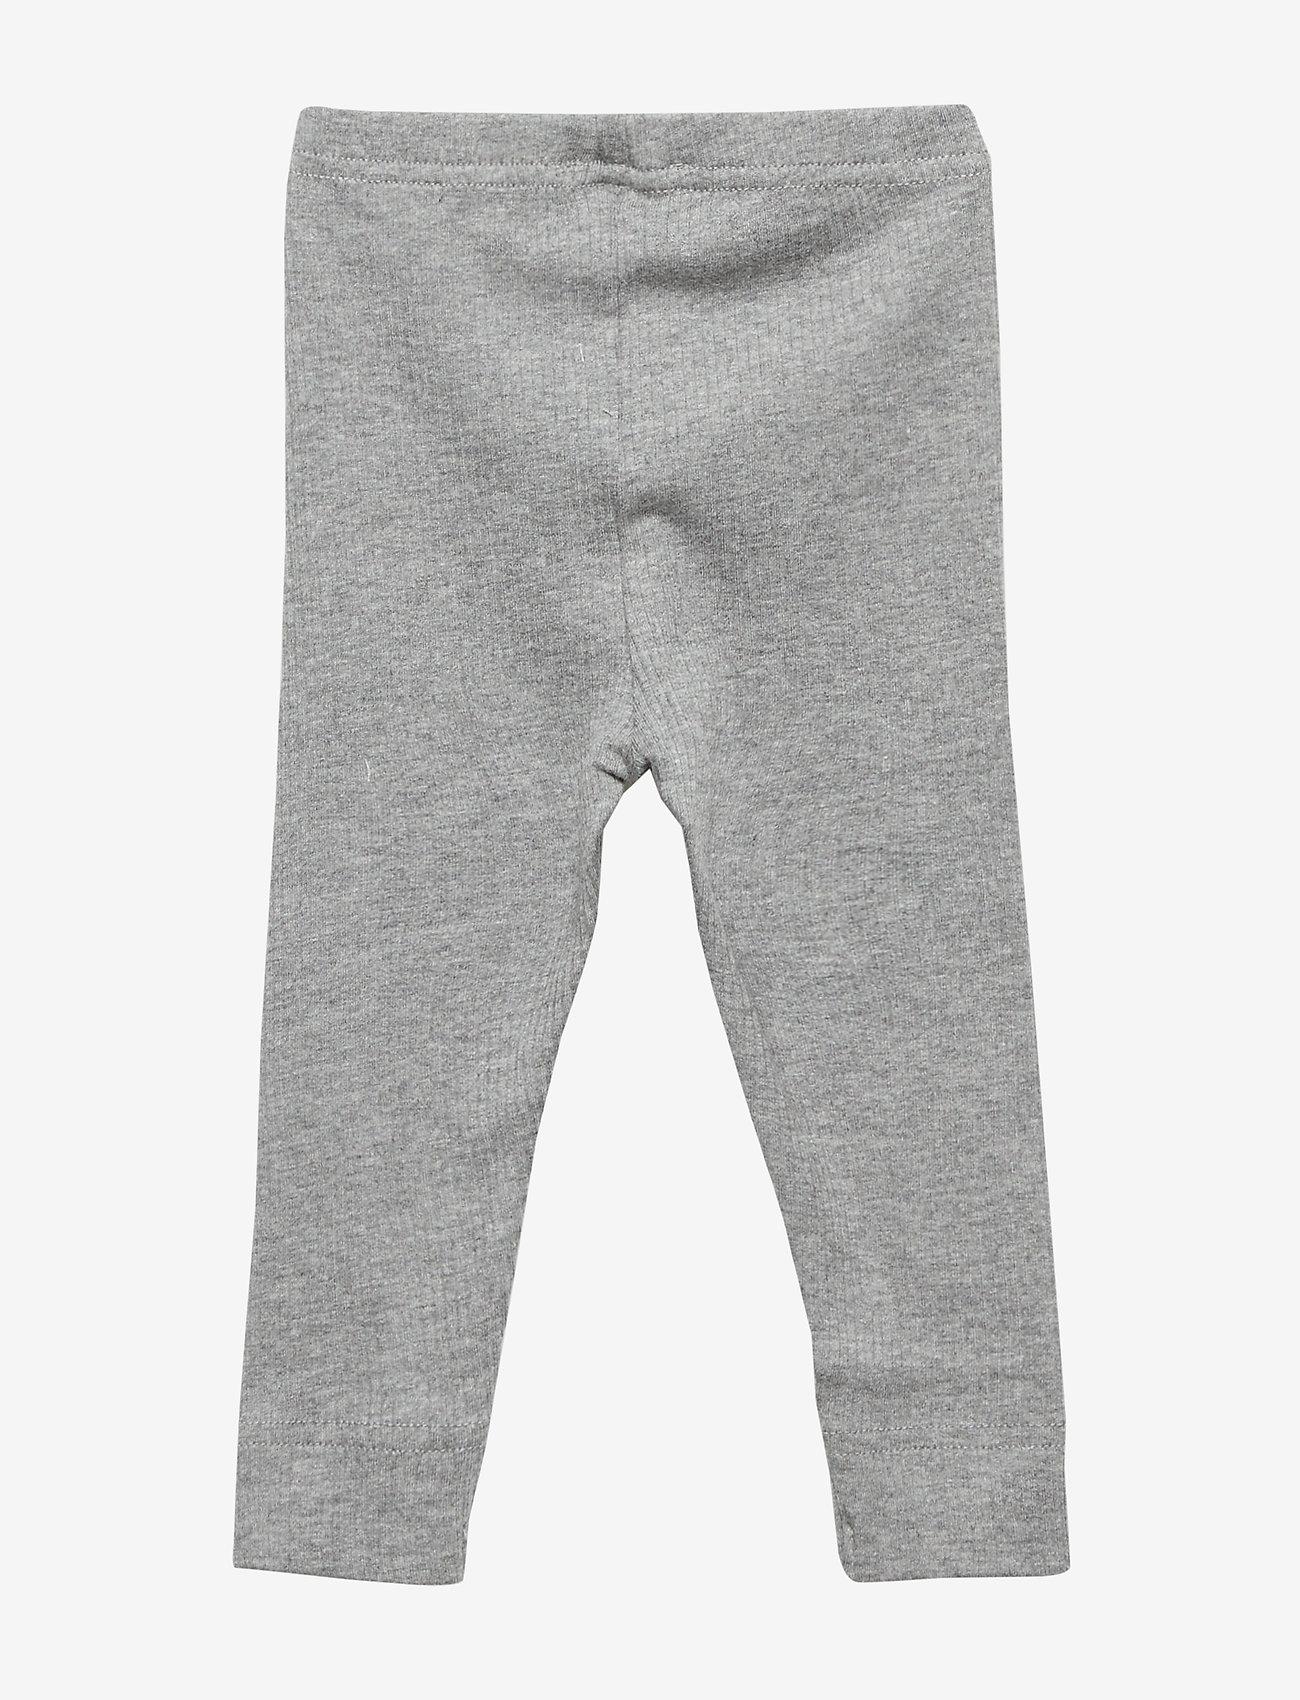 MarMar Cph - Leg - leggings - grey melange - 1